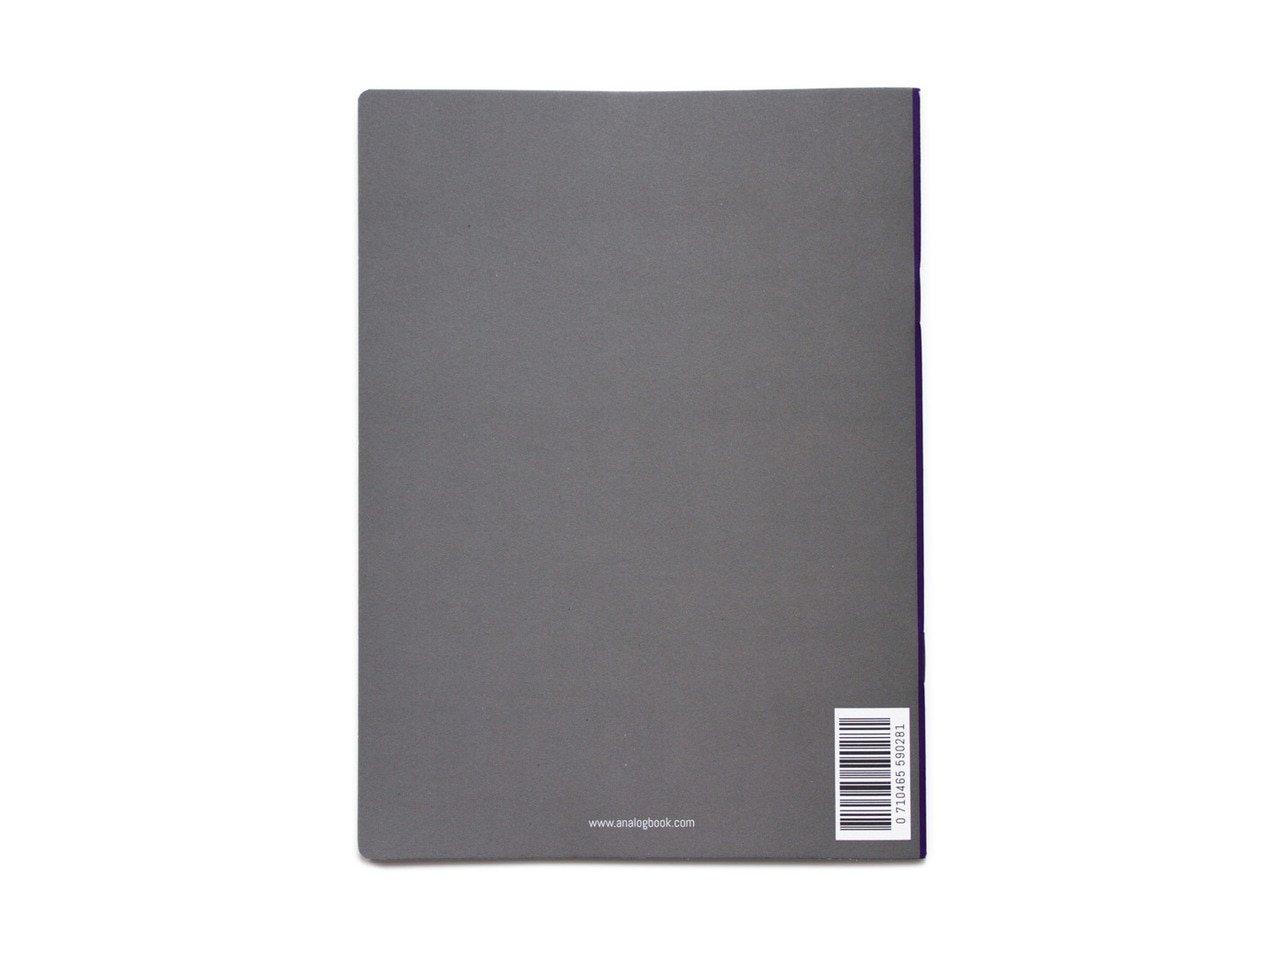 Analogbook Notebook - Darkroom Processing